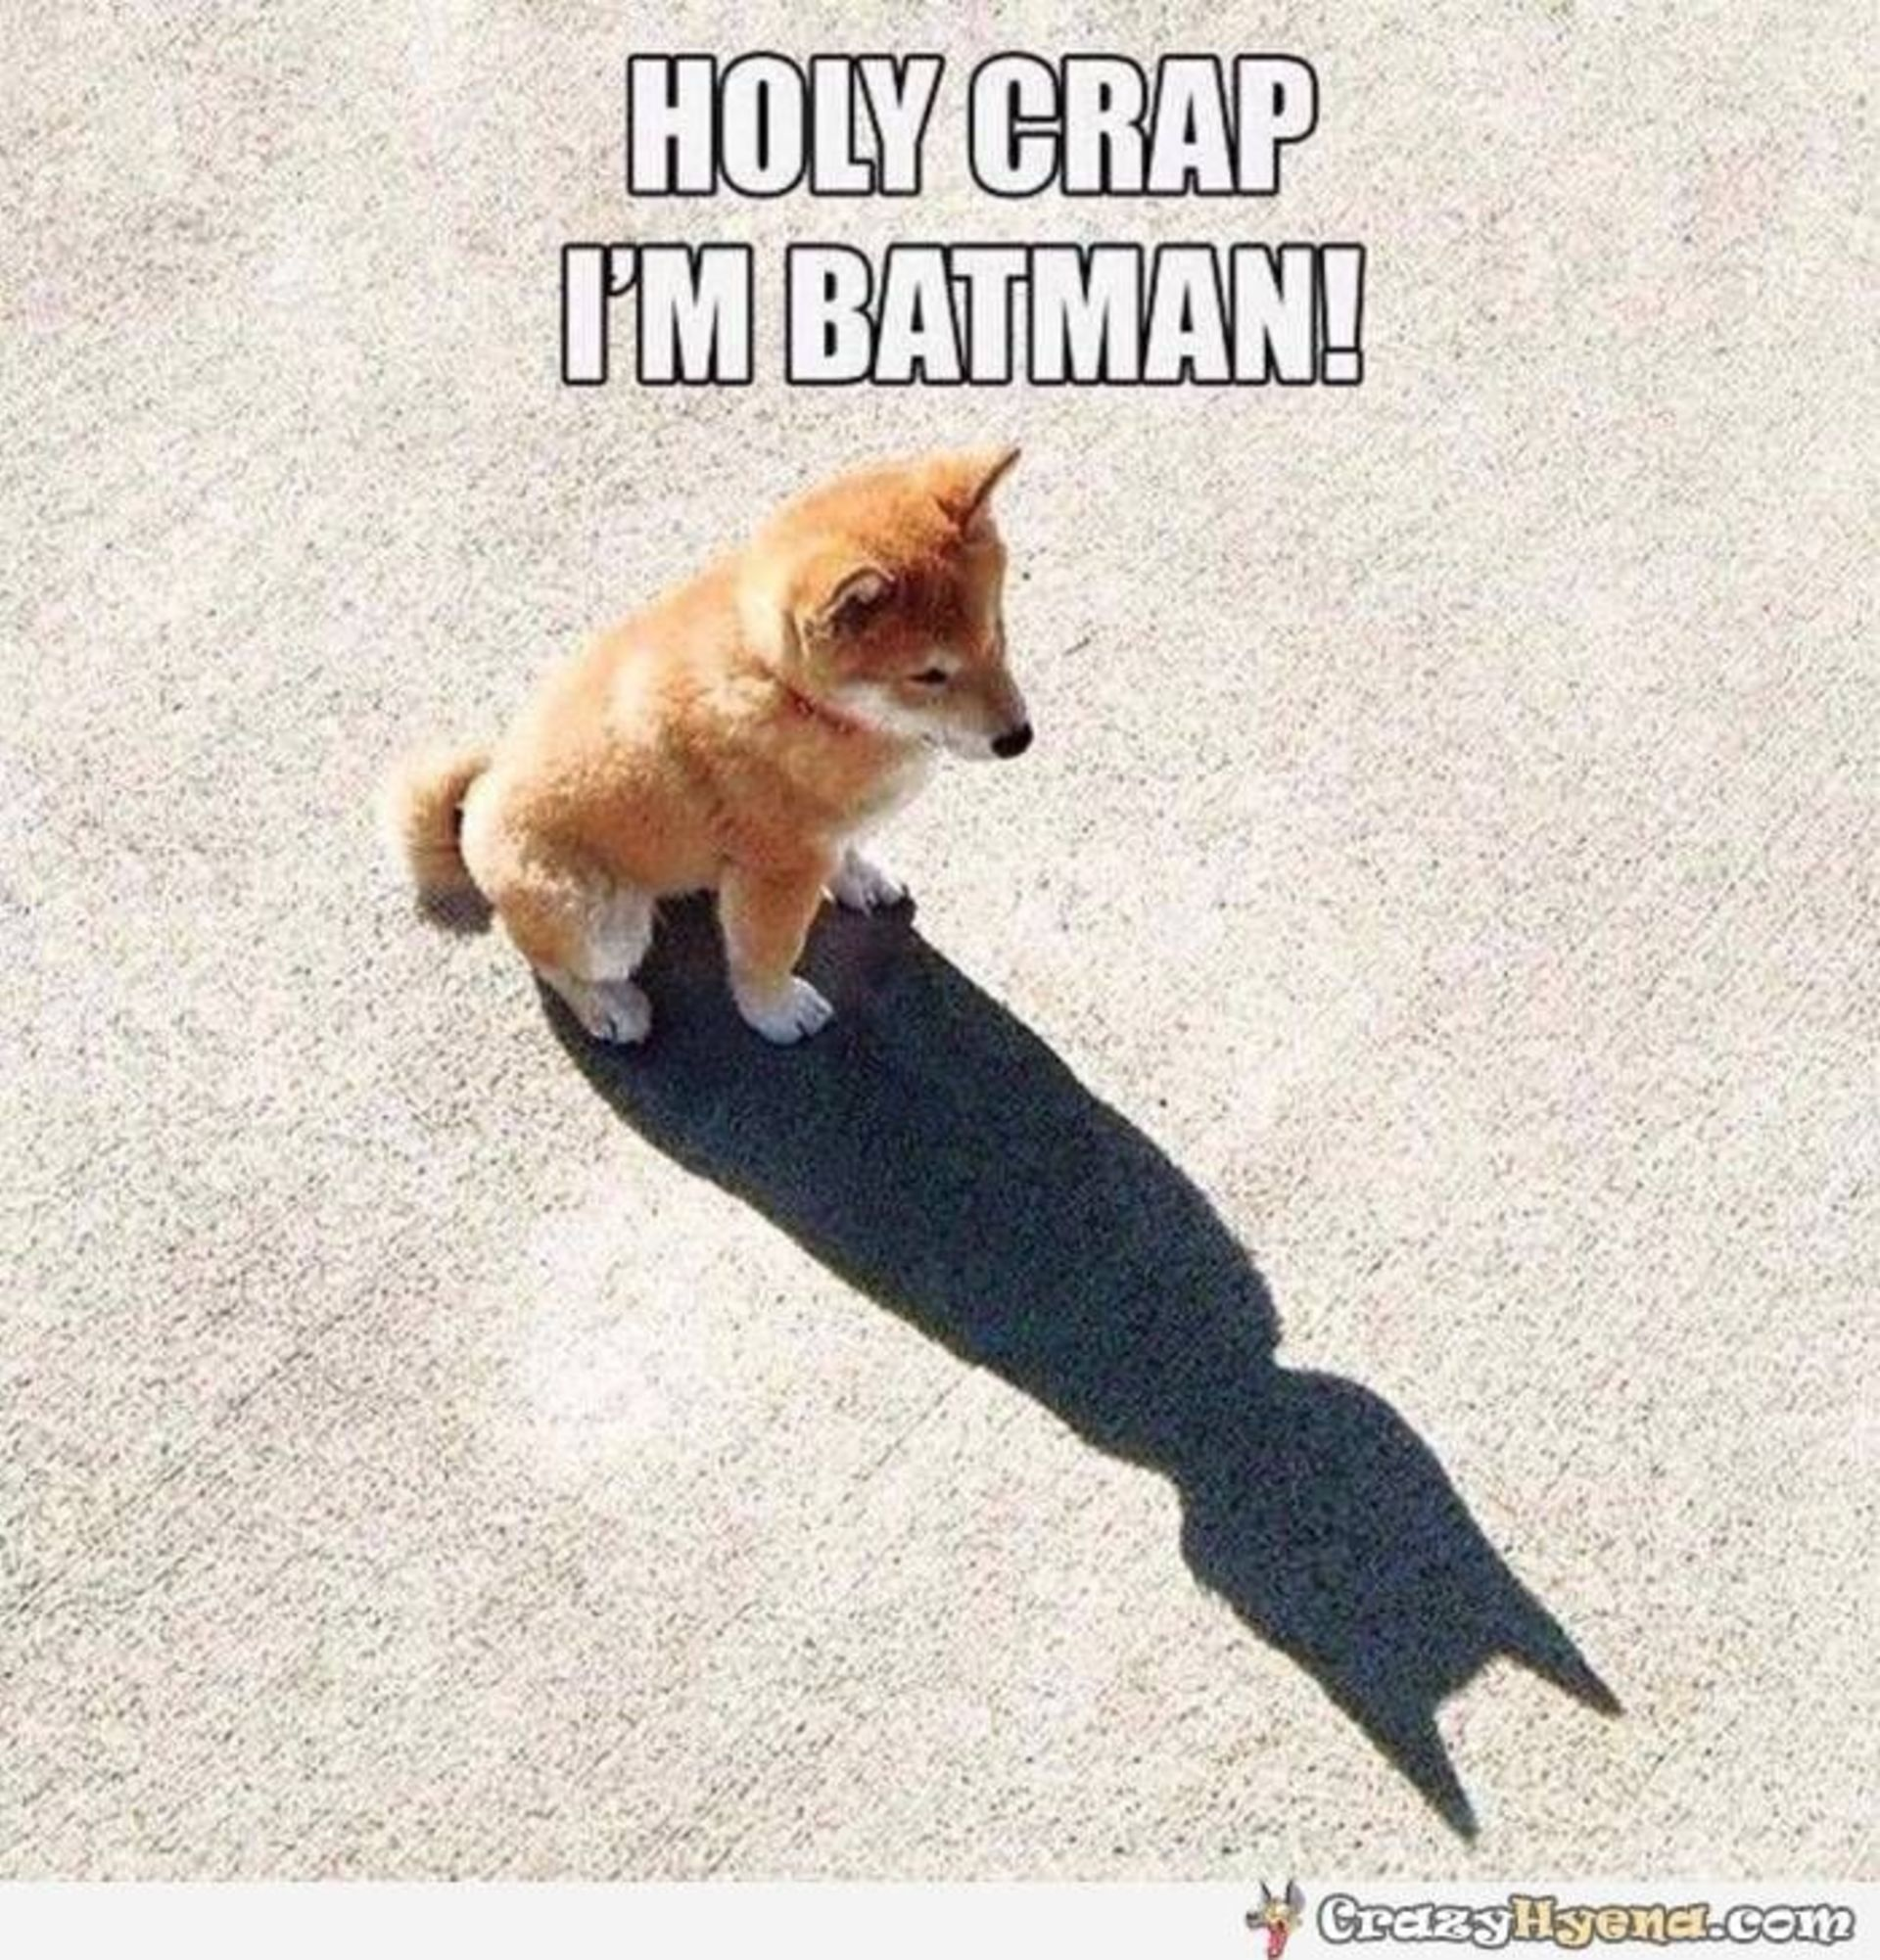 Holy Spring Market Batman